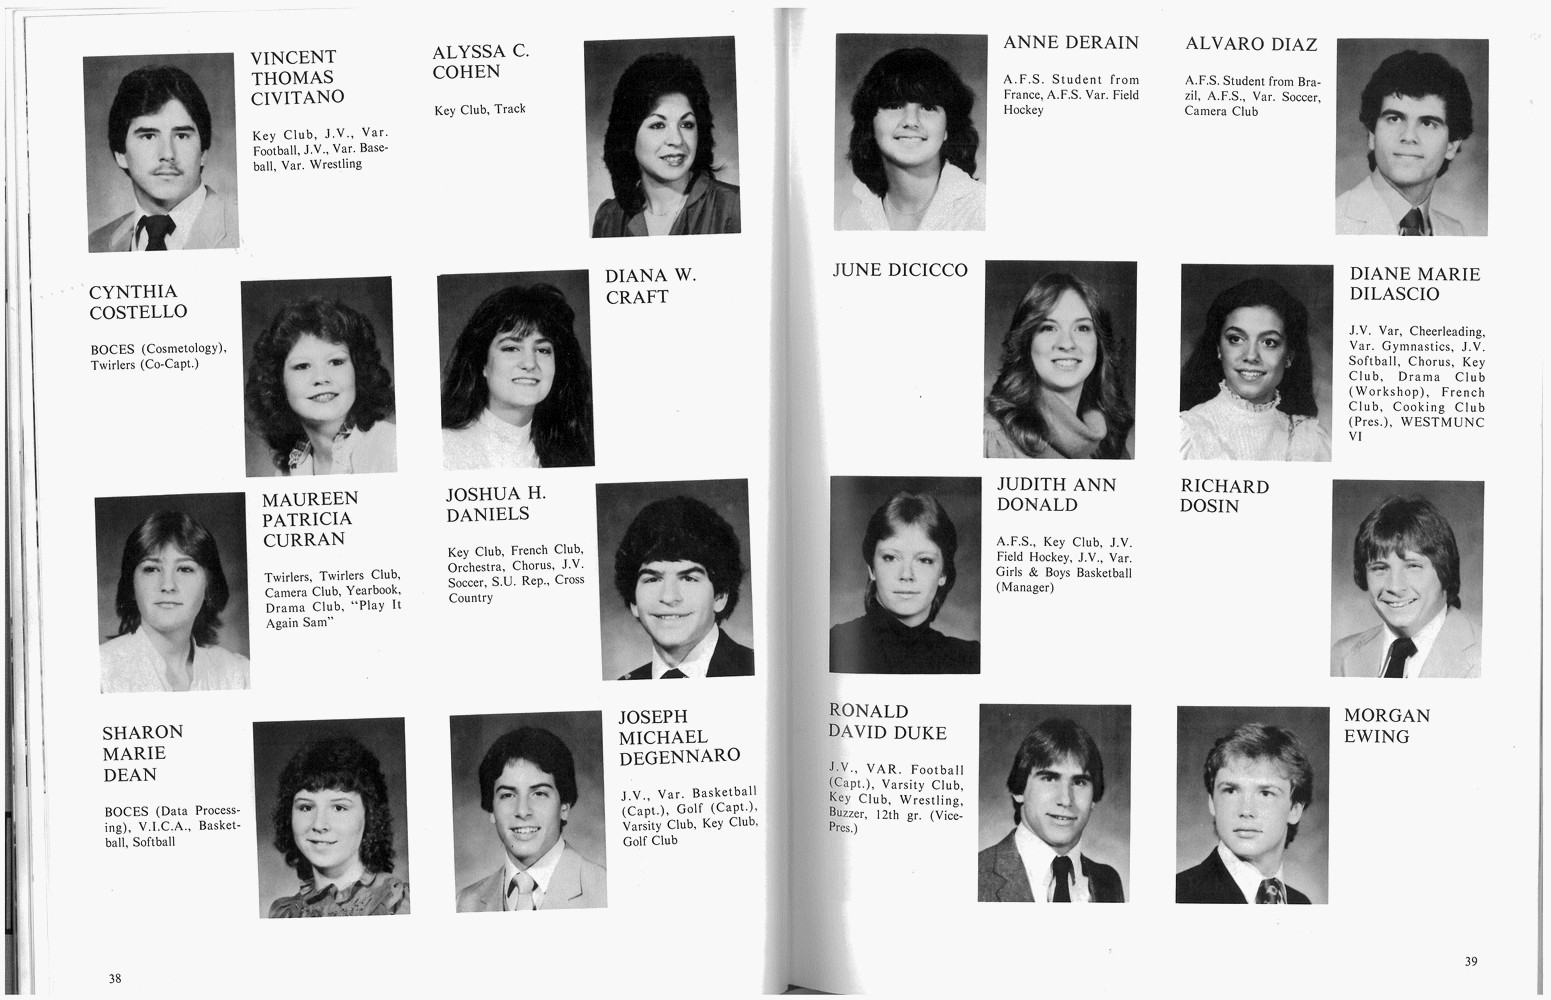 1983 « Hastings Alumni Association